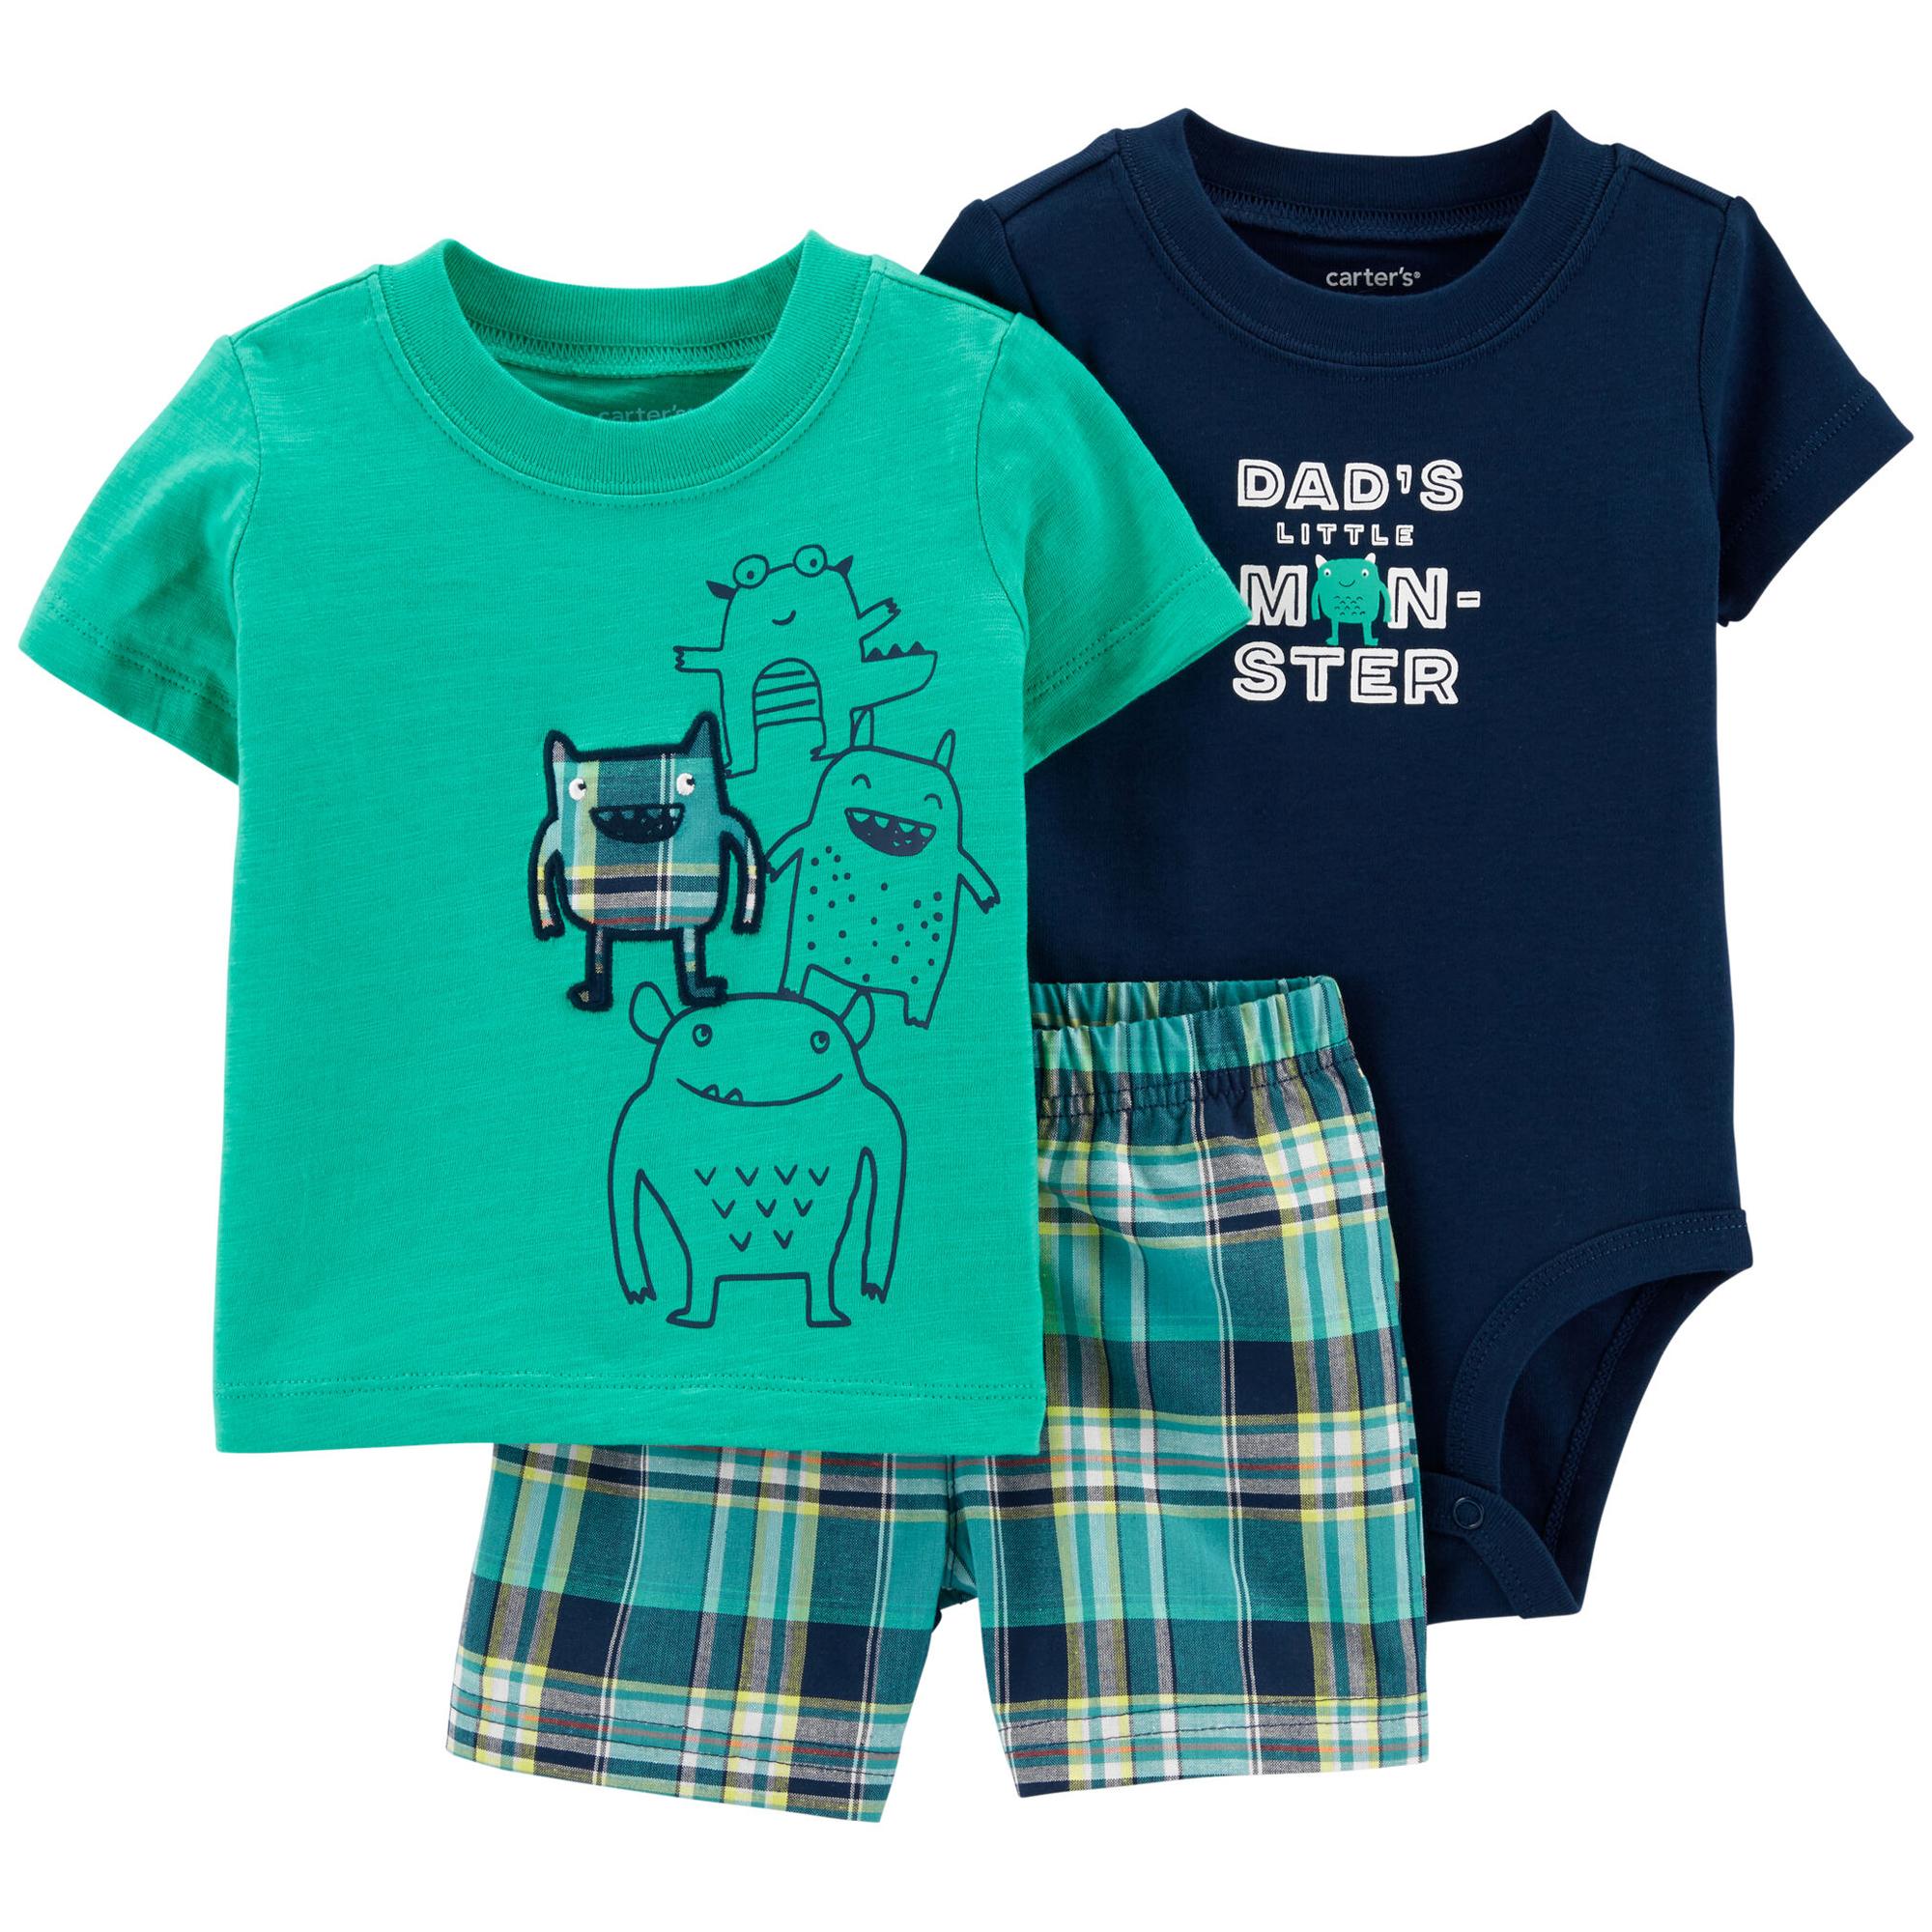 ست 3 تکه لباس نوزادی پسرانه کارترز طرح هیولا کوچولو کد M286